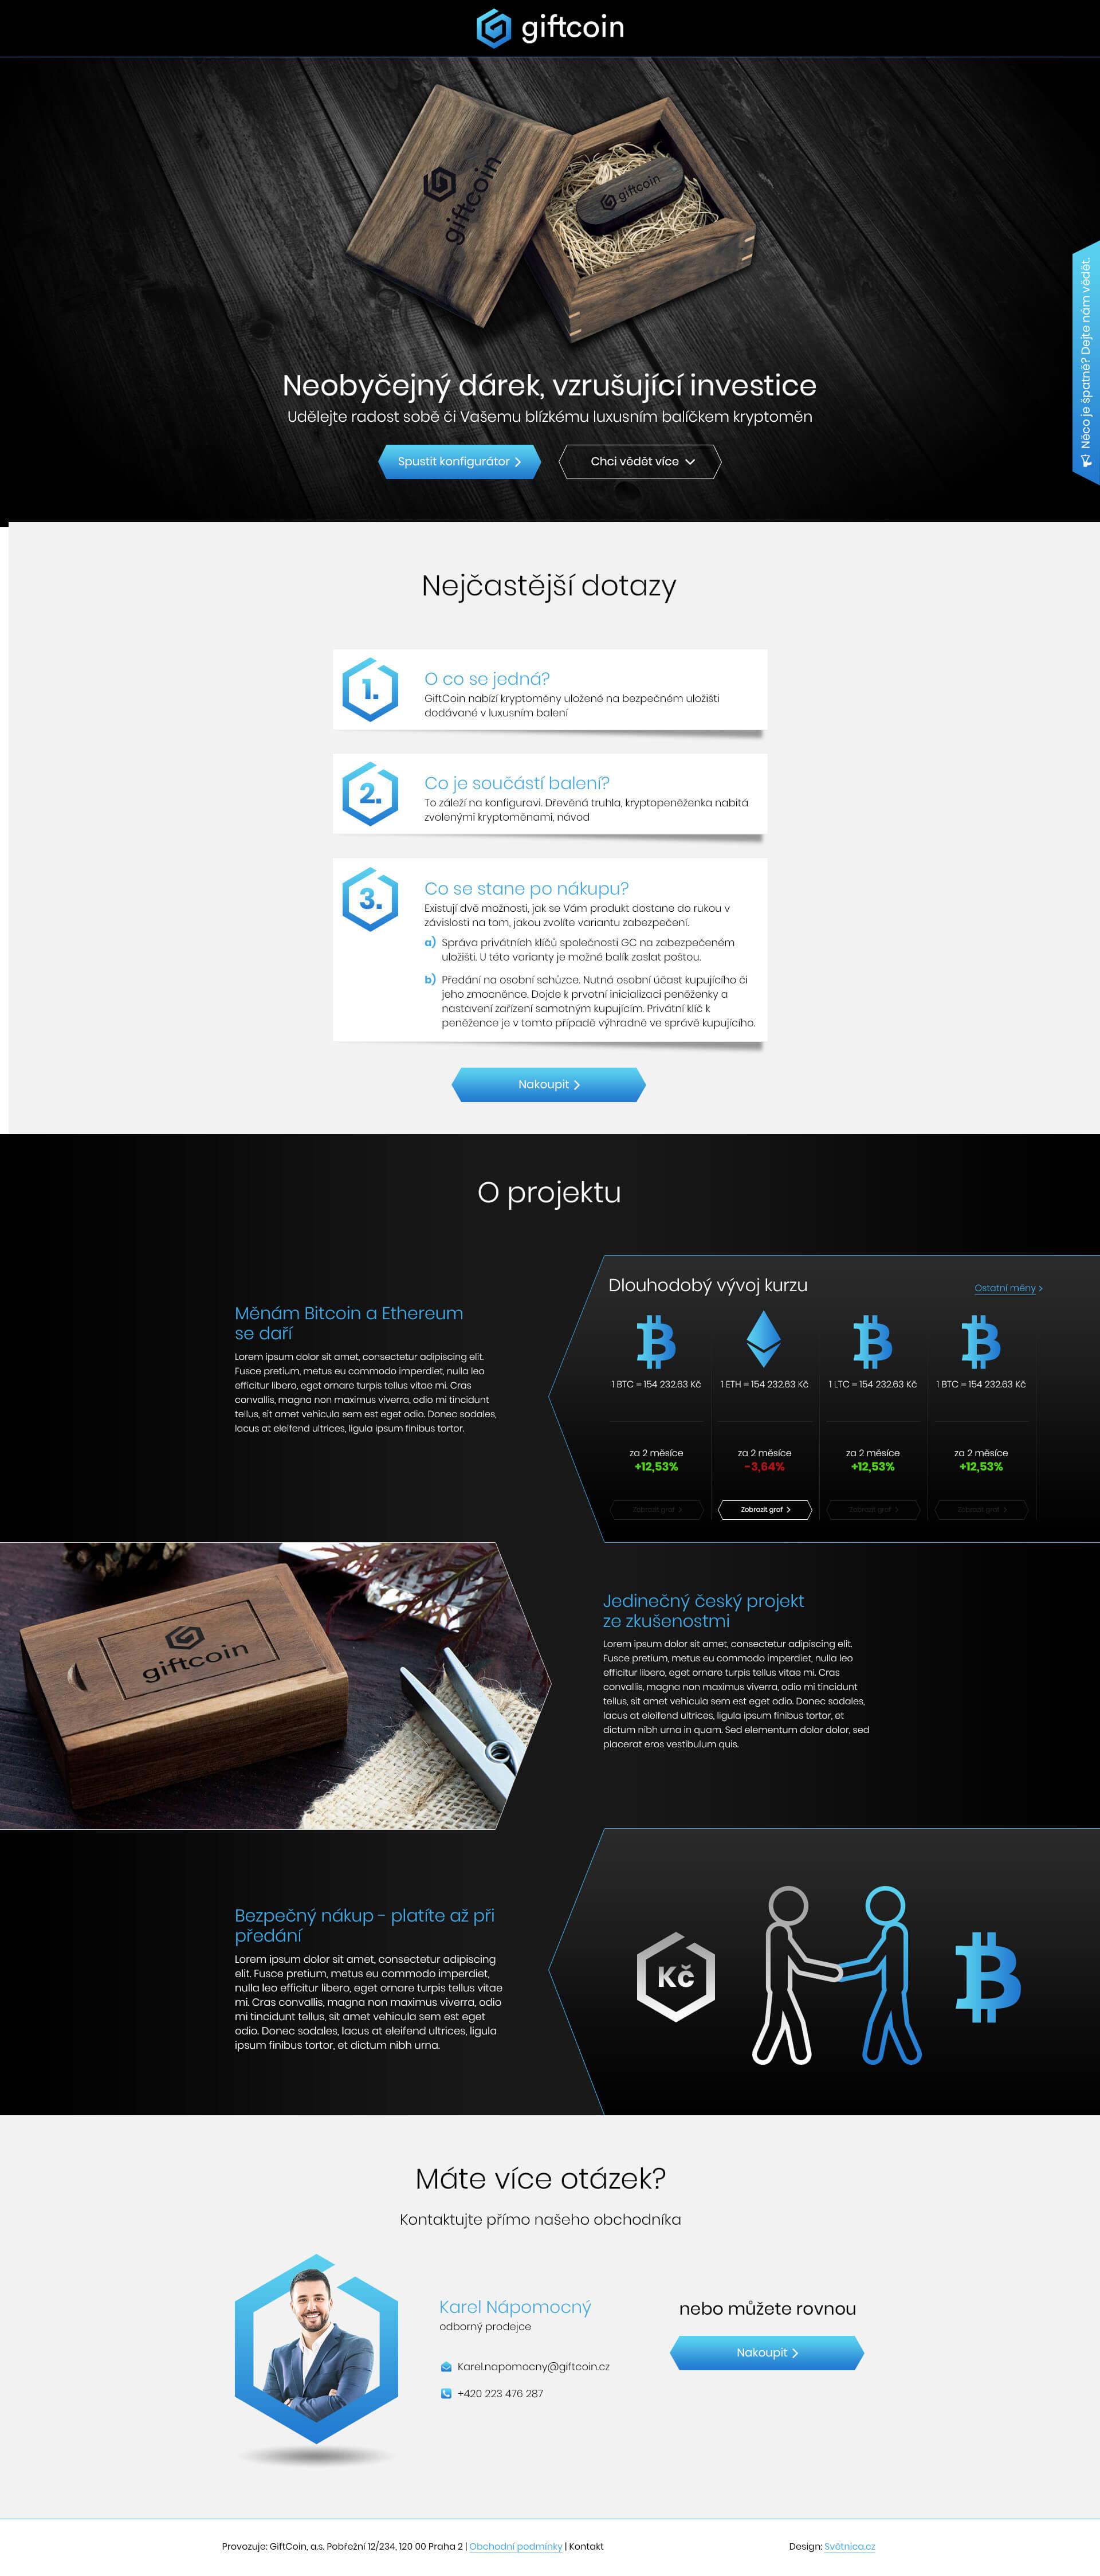 giftcoin-webdesign-svetnica-uvod